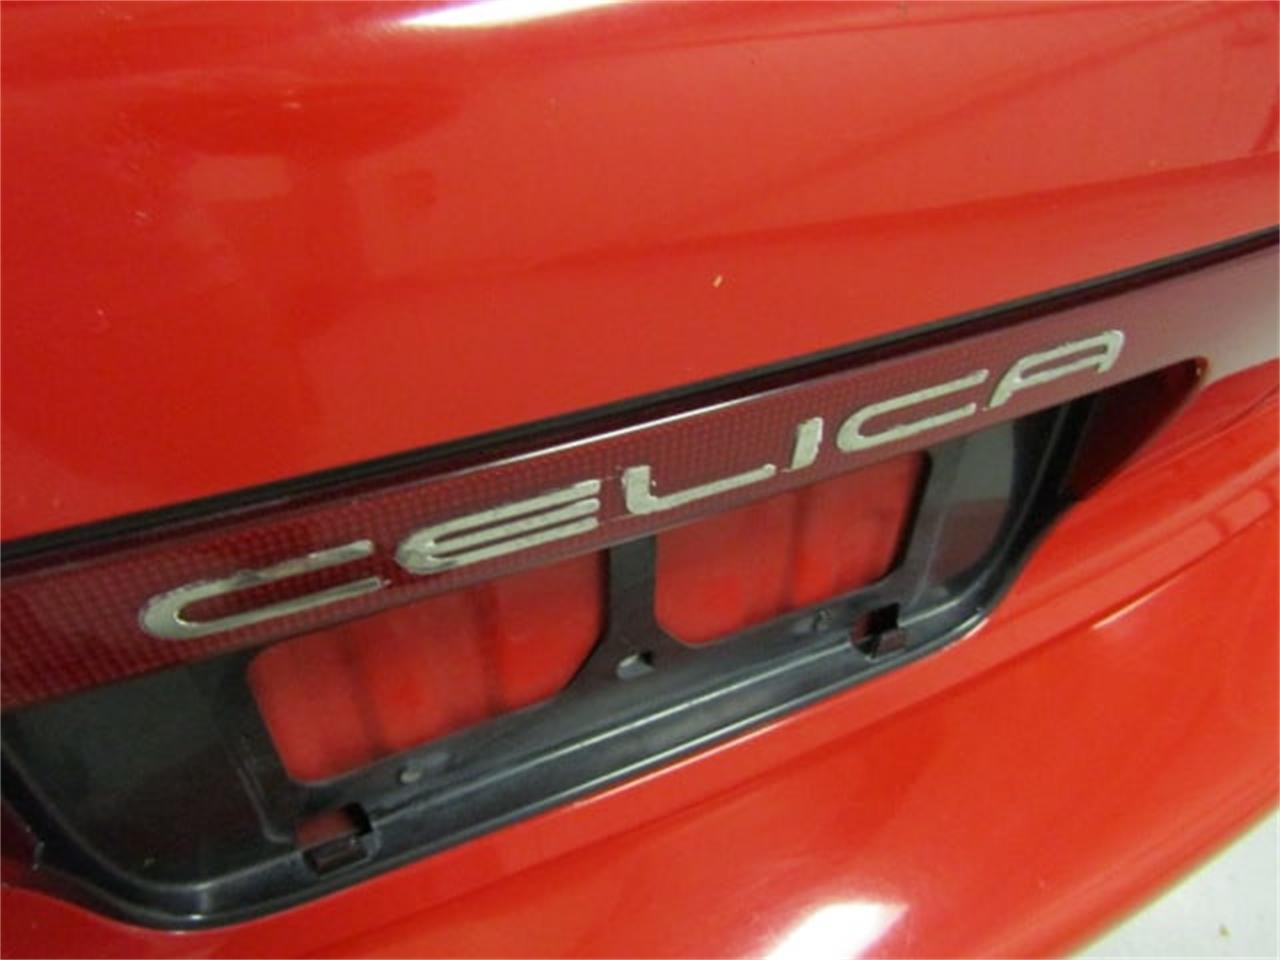 Large Picture of '90 Toyota Celica located in Virginia - $7,918.00 - LI31